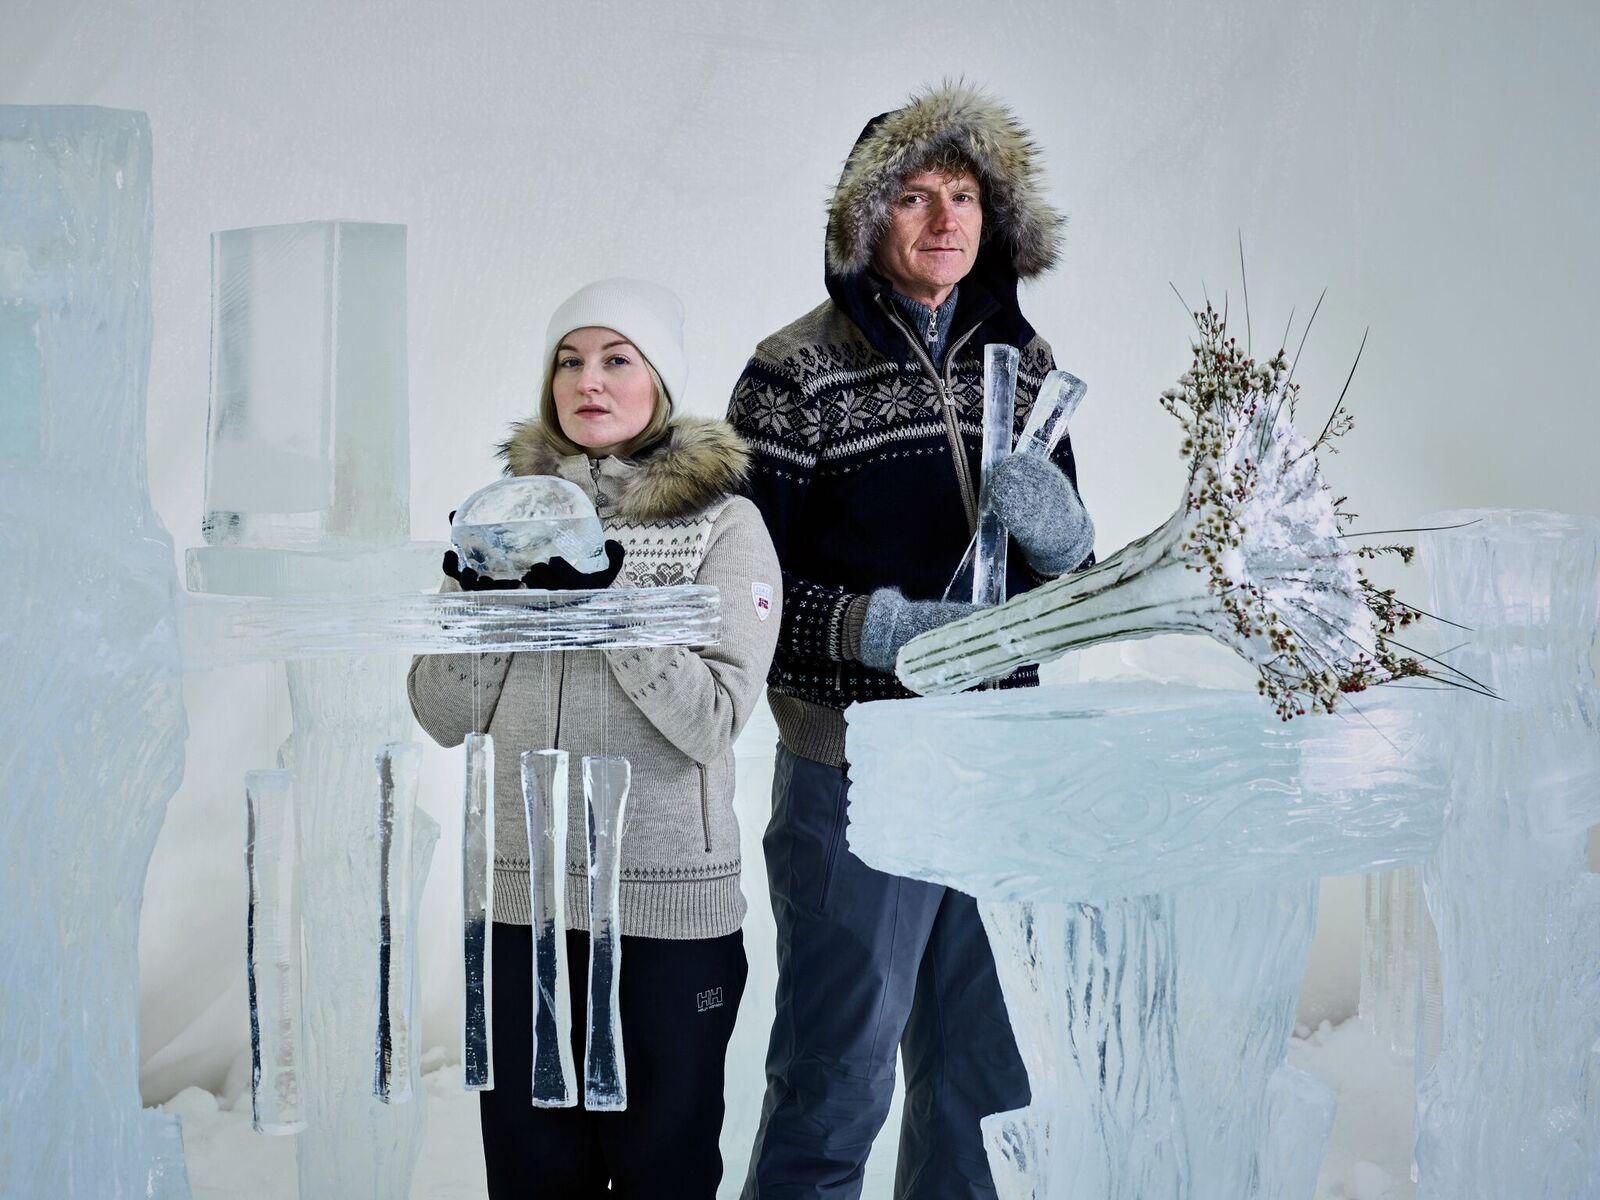 Terje Isungset 氷の楽器公演、明日開催_e0081206_18323048.jpg